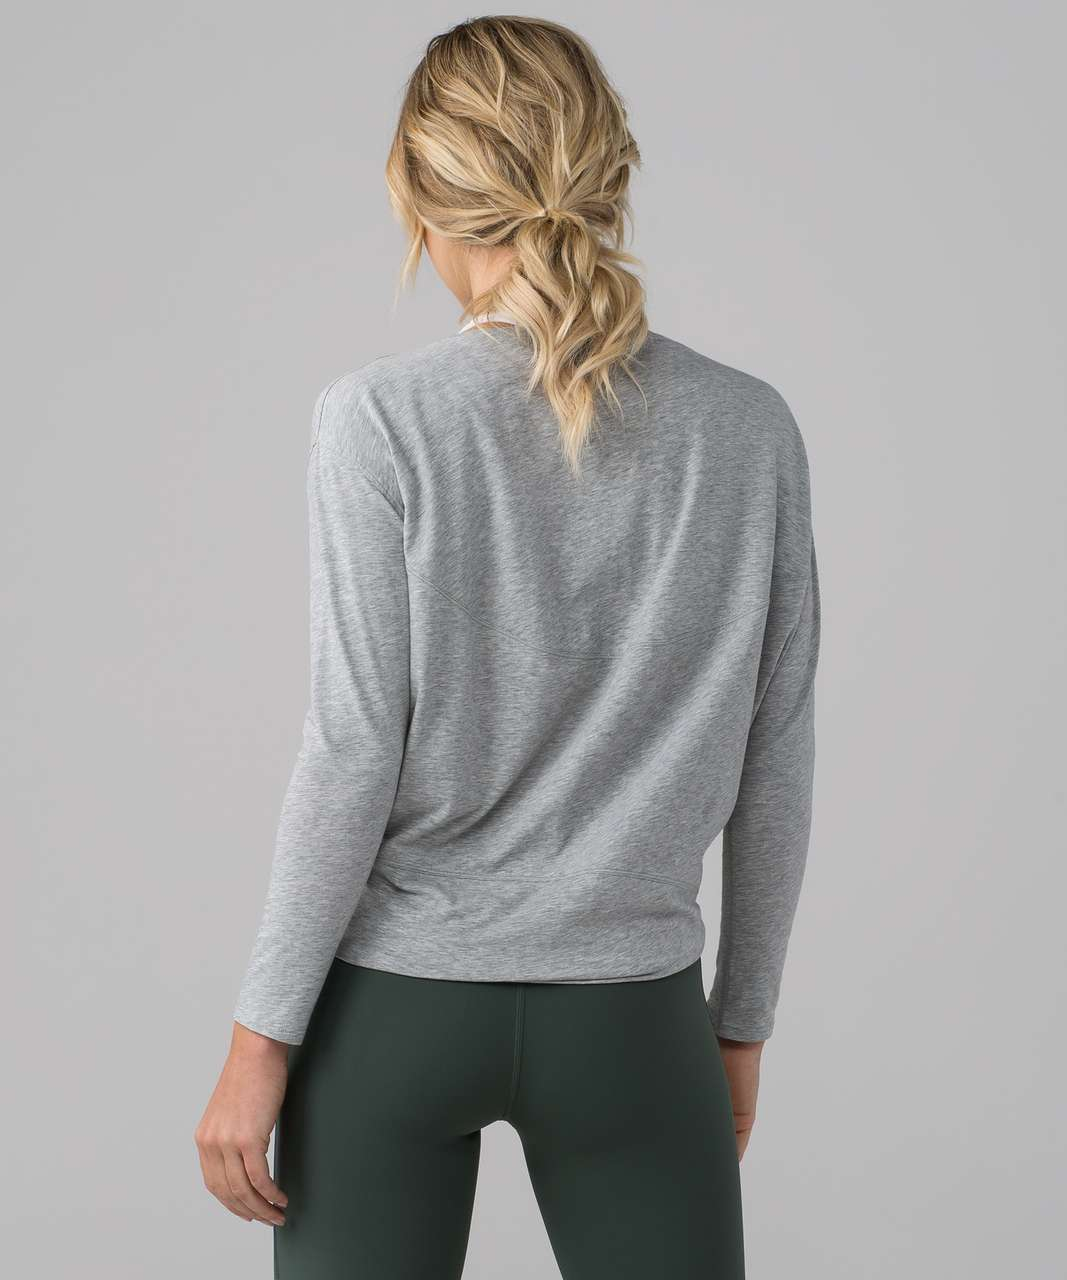 Lululemon Back In Action Long Sleeve - Heathered Core Light Grey